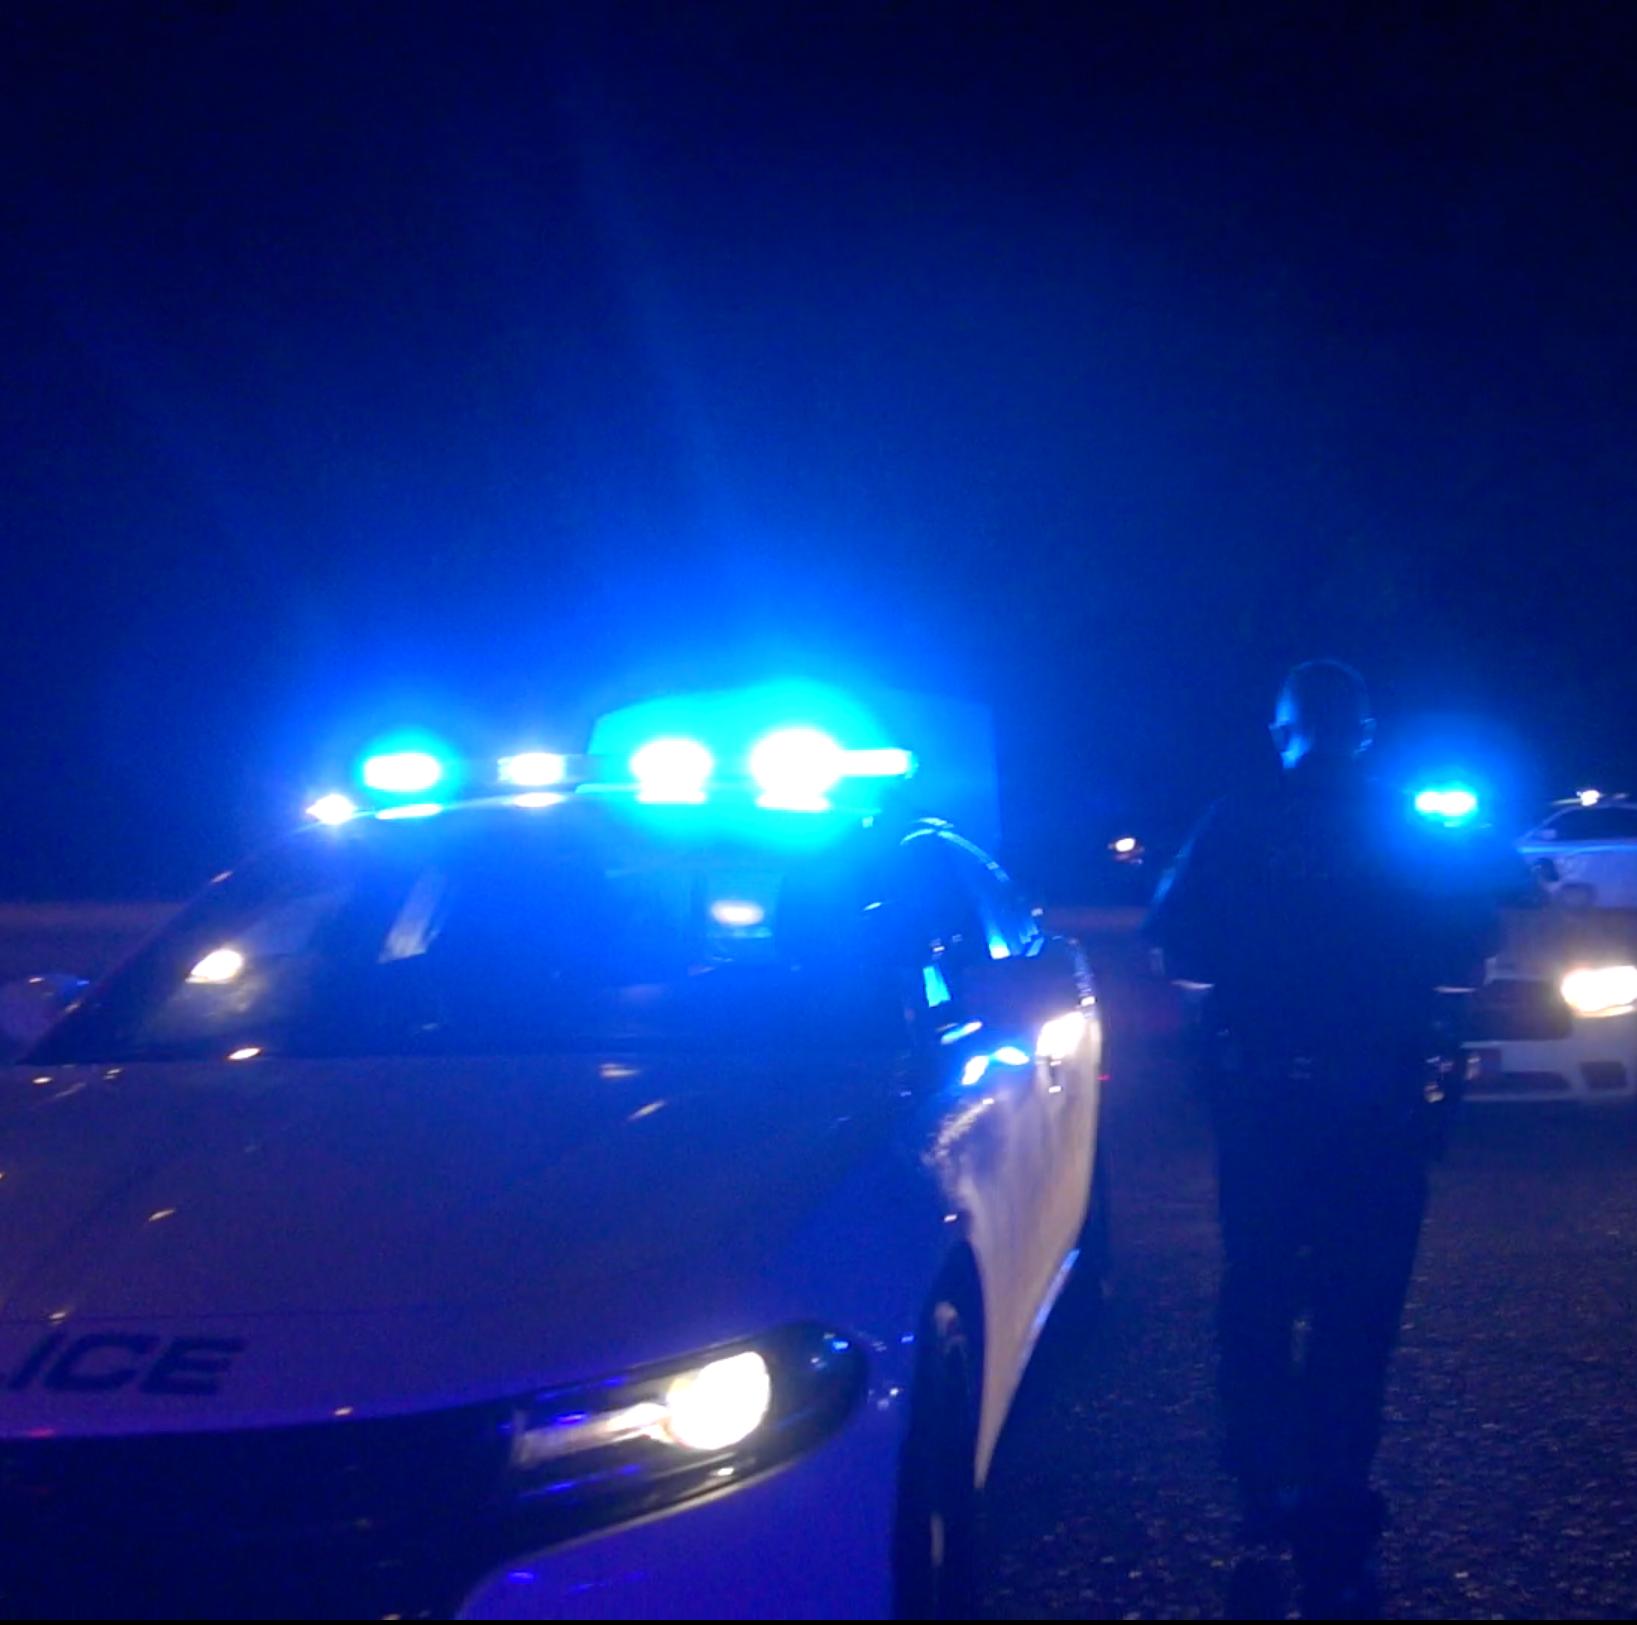 Man found dead inside car was shot multiple times, Jackson police say